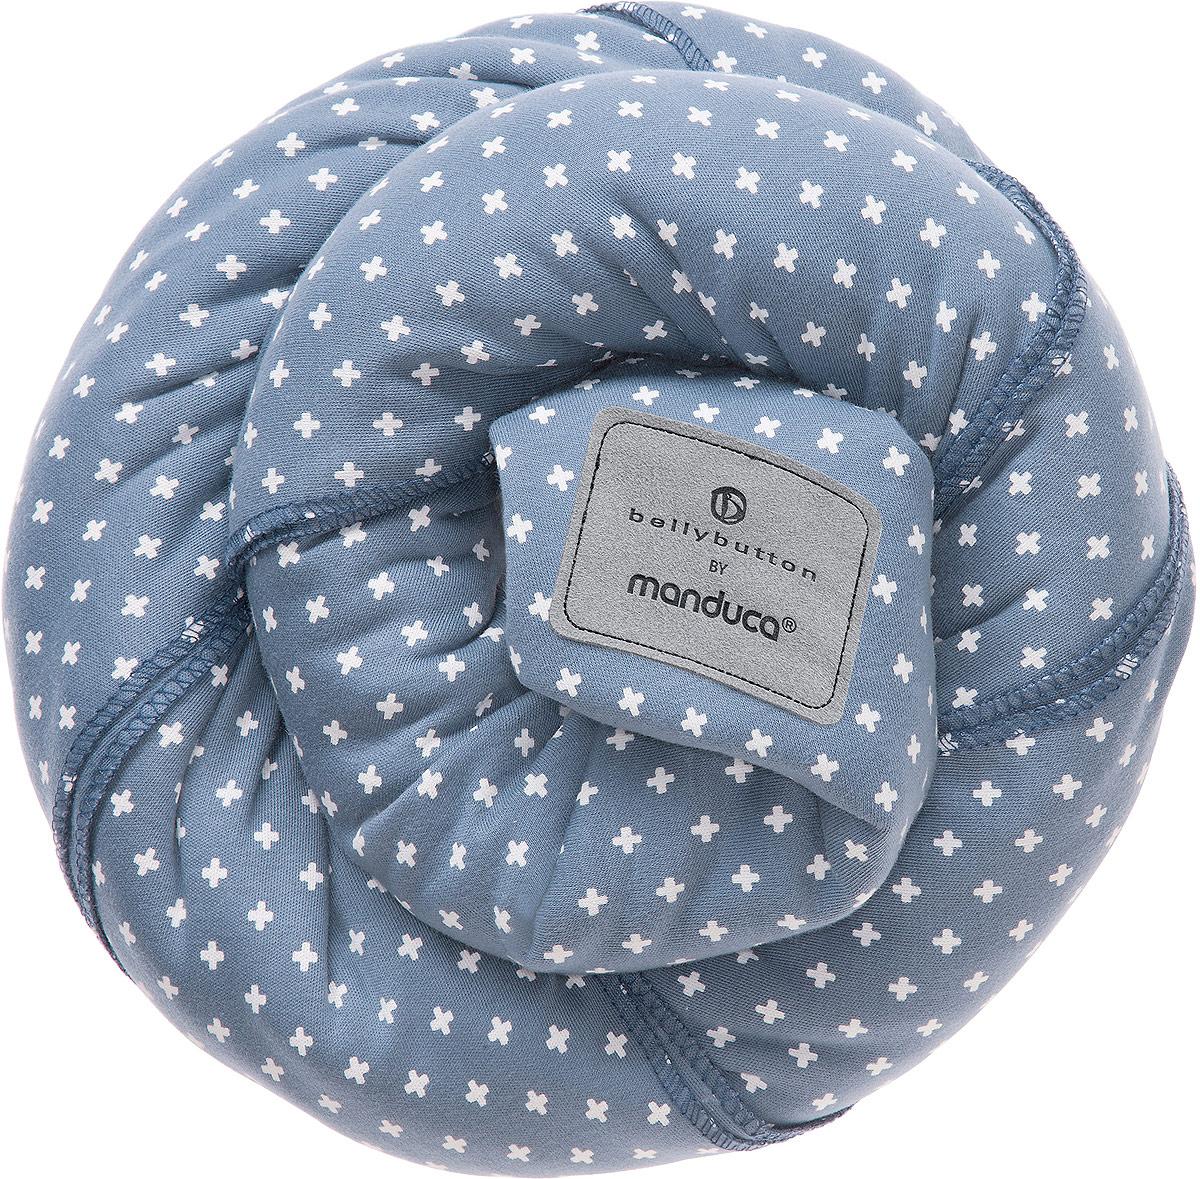 Manduca Слинг-шарф bellybutton WildCrosses цвет голубой - Рюкзаки, слинги, кенгуру